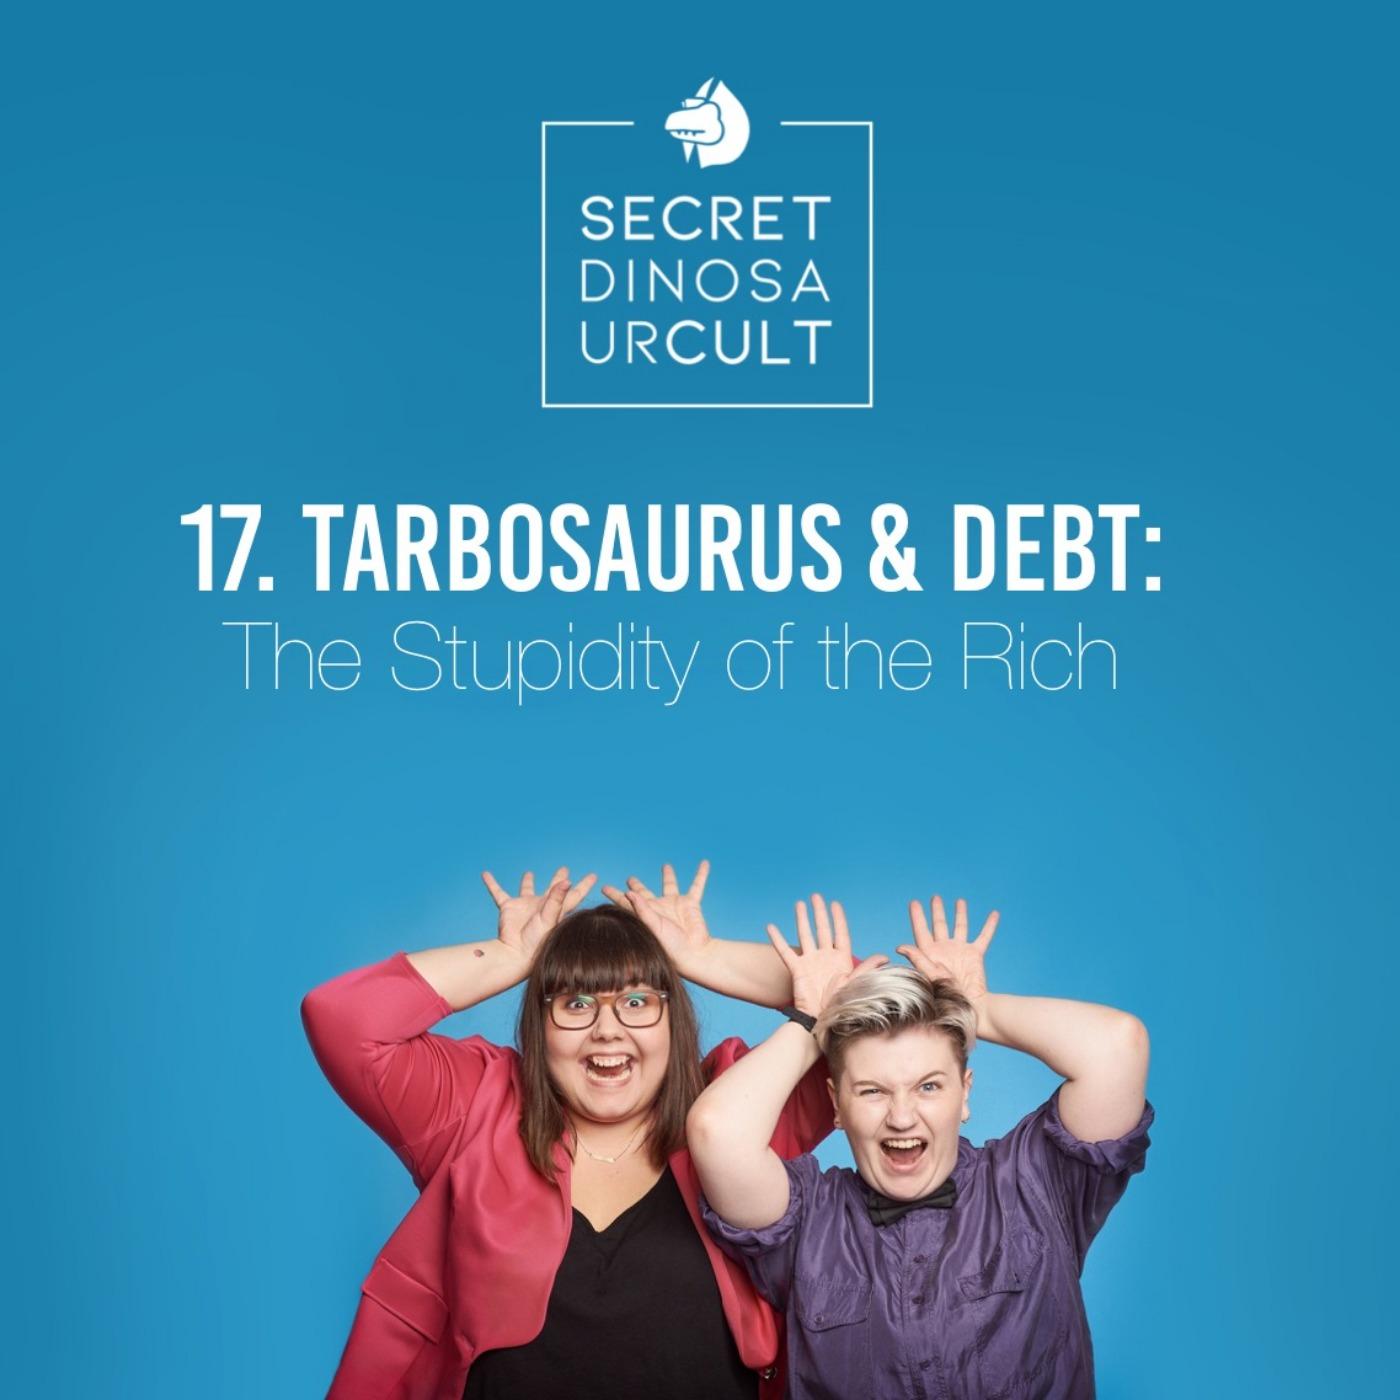 17. Tarbosaurus & Debt: The Stupidity of the Rich